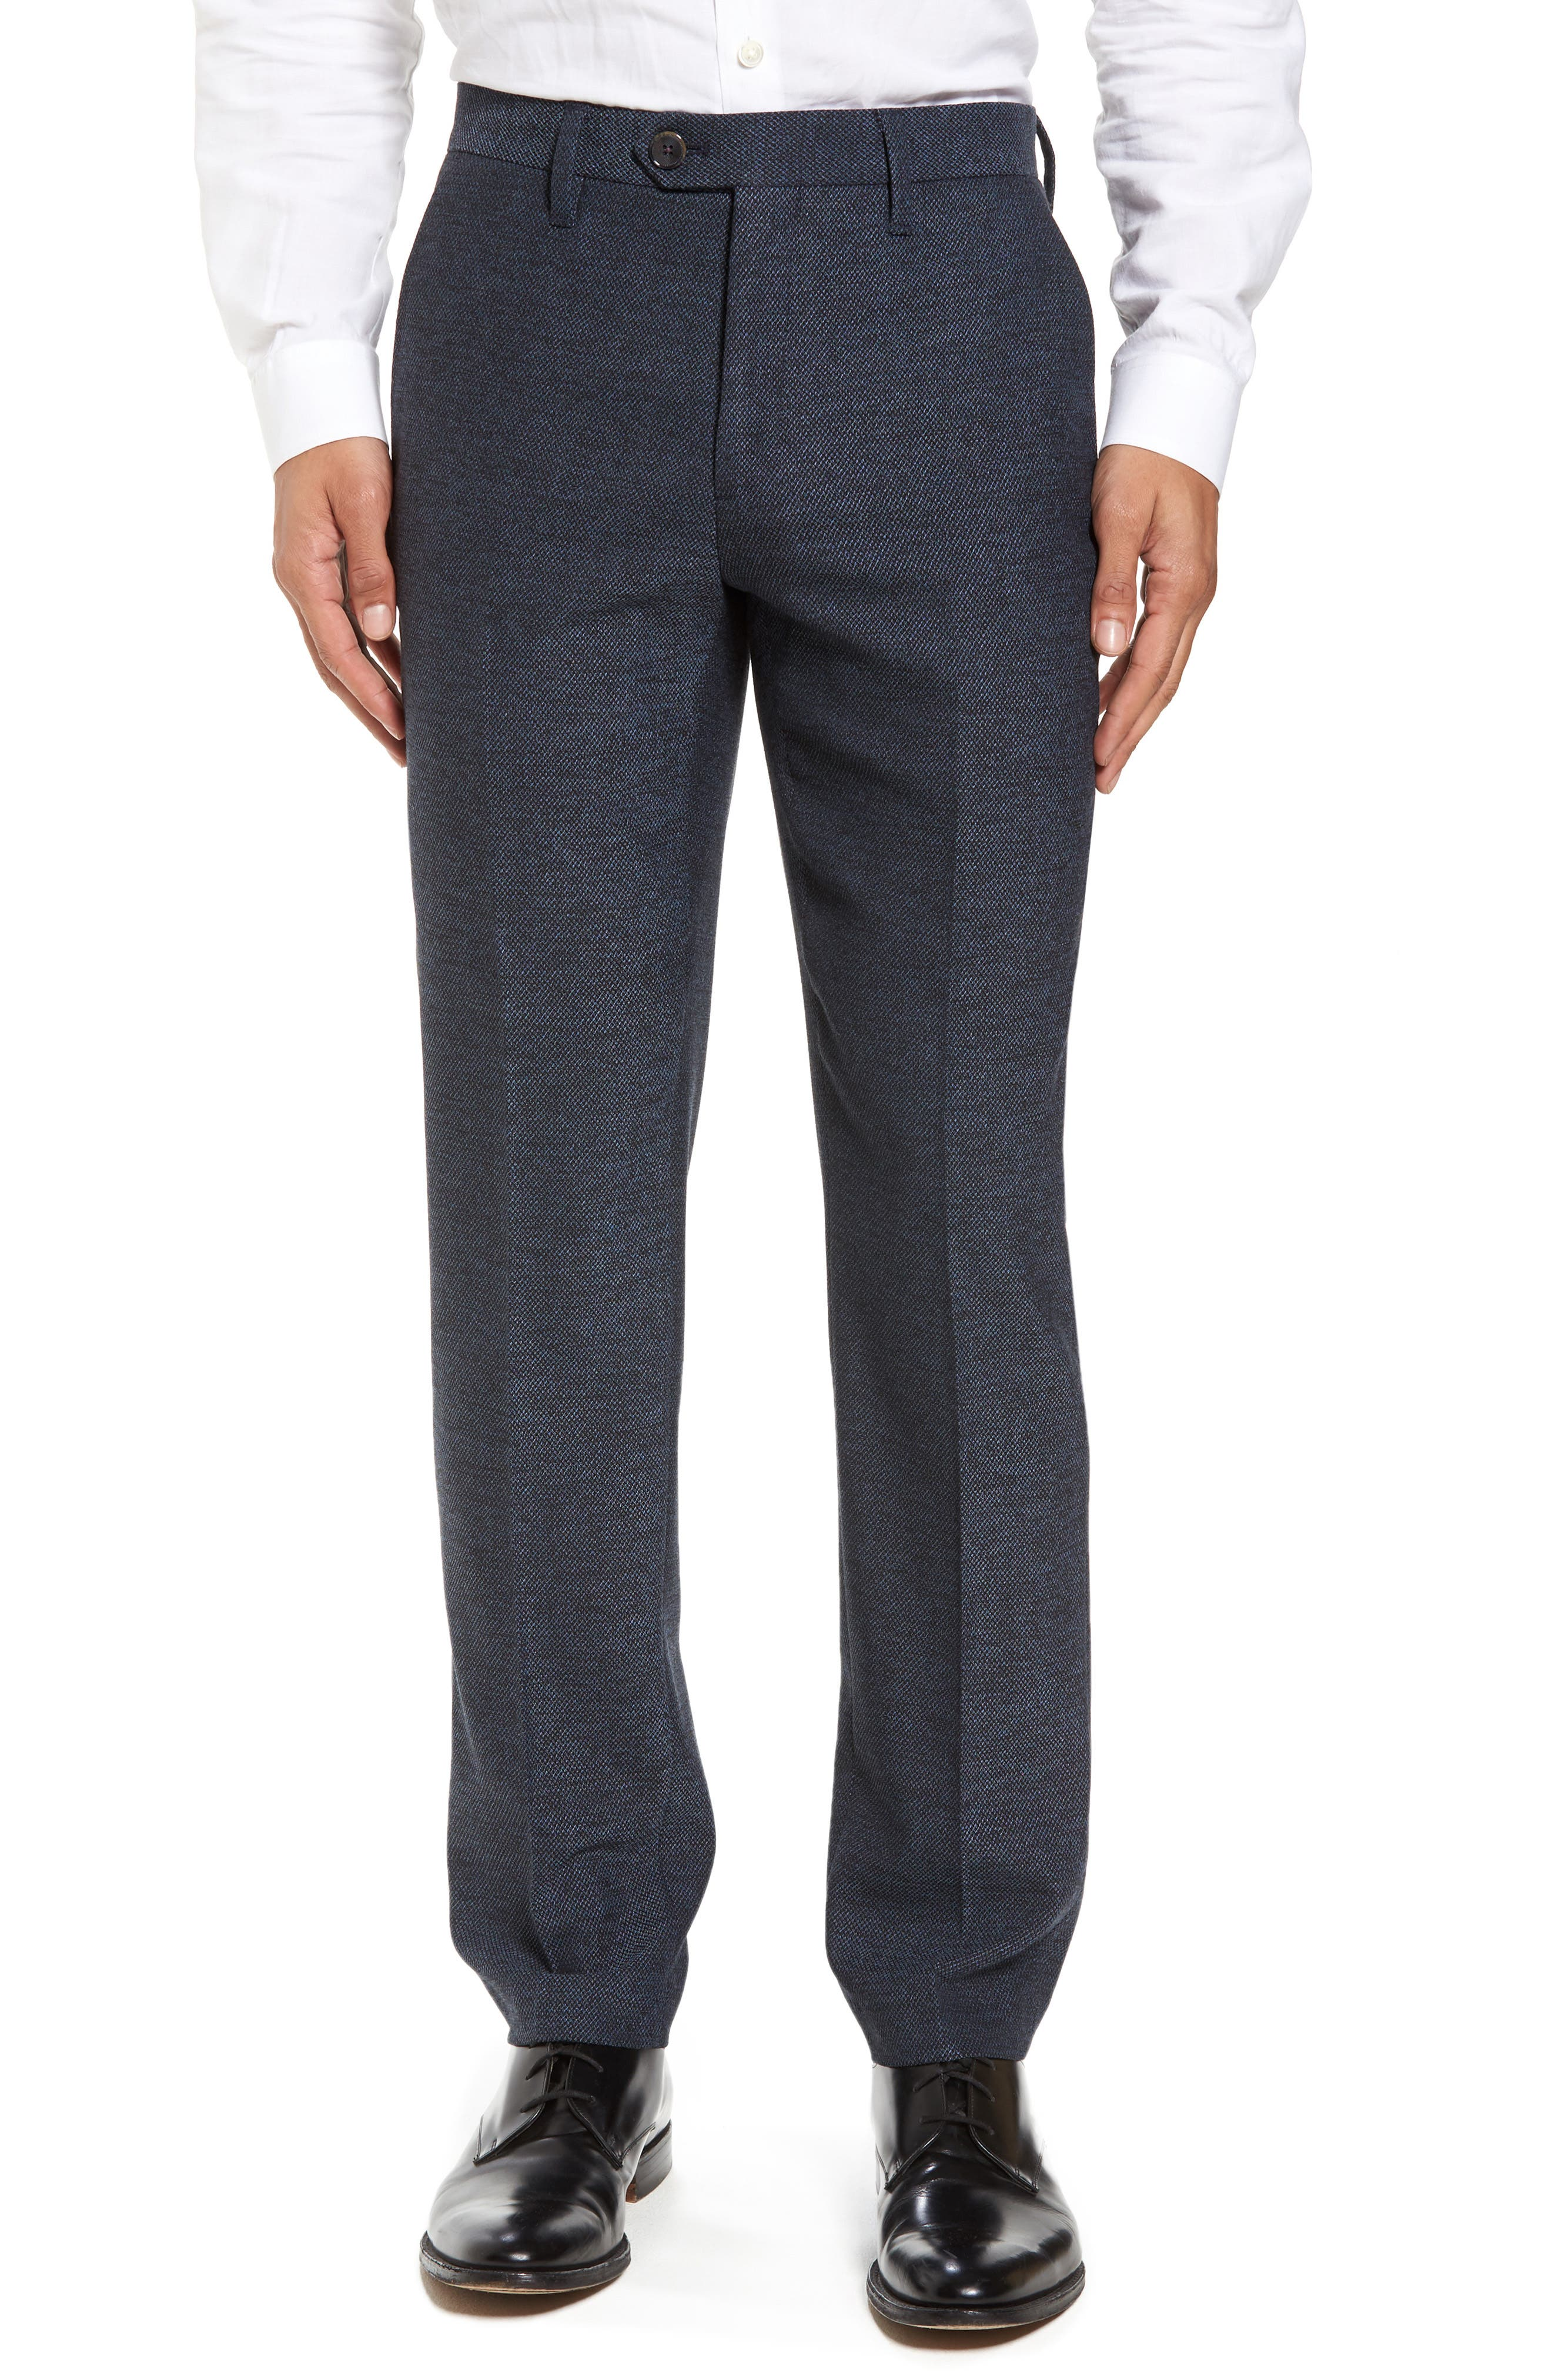 Main Image - Ted Baker London Porttro Modern Slim Fit Trousers